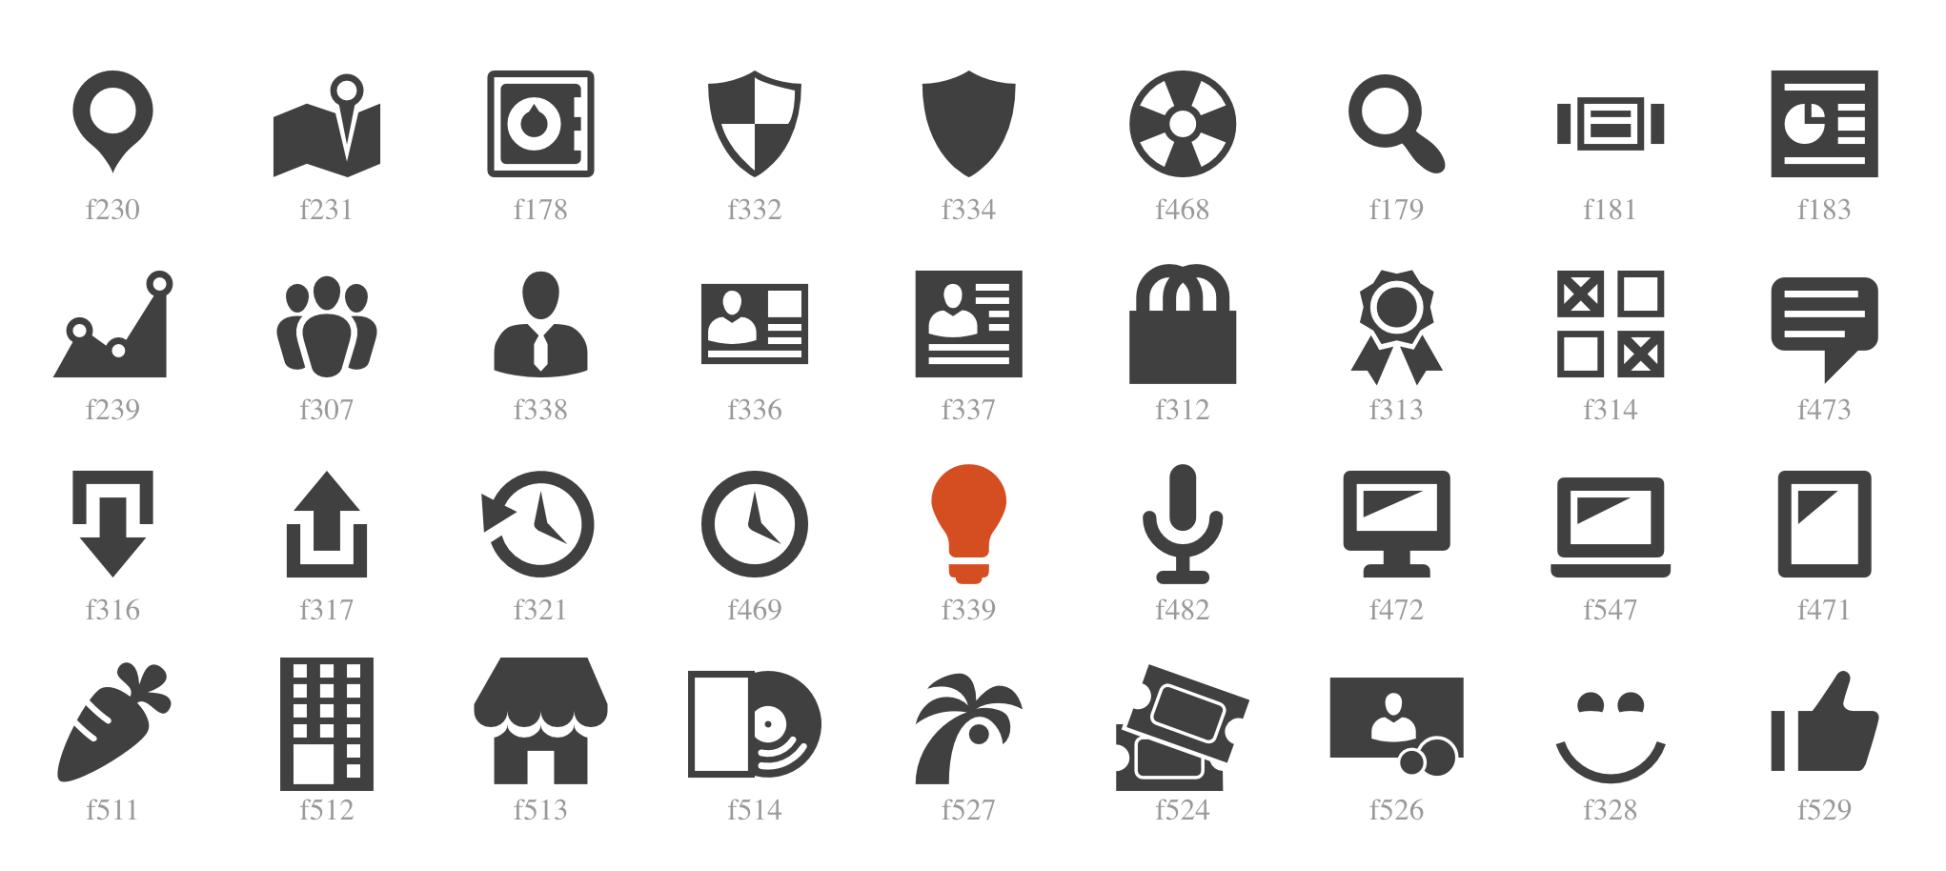 Icon fonts: Dashicons